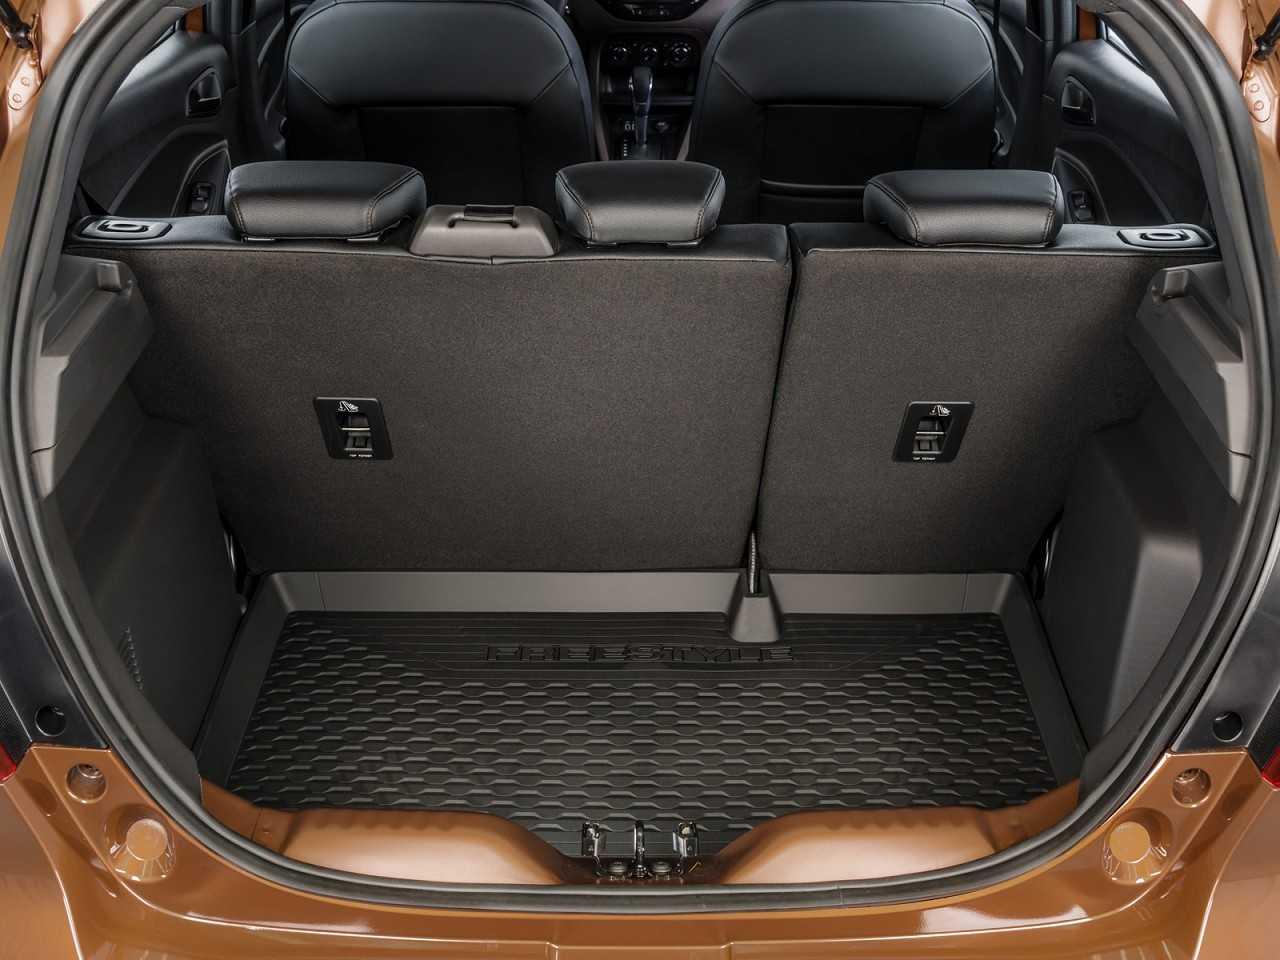 FordKa 2019 - porta-malas